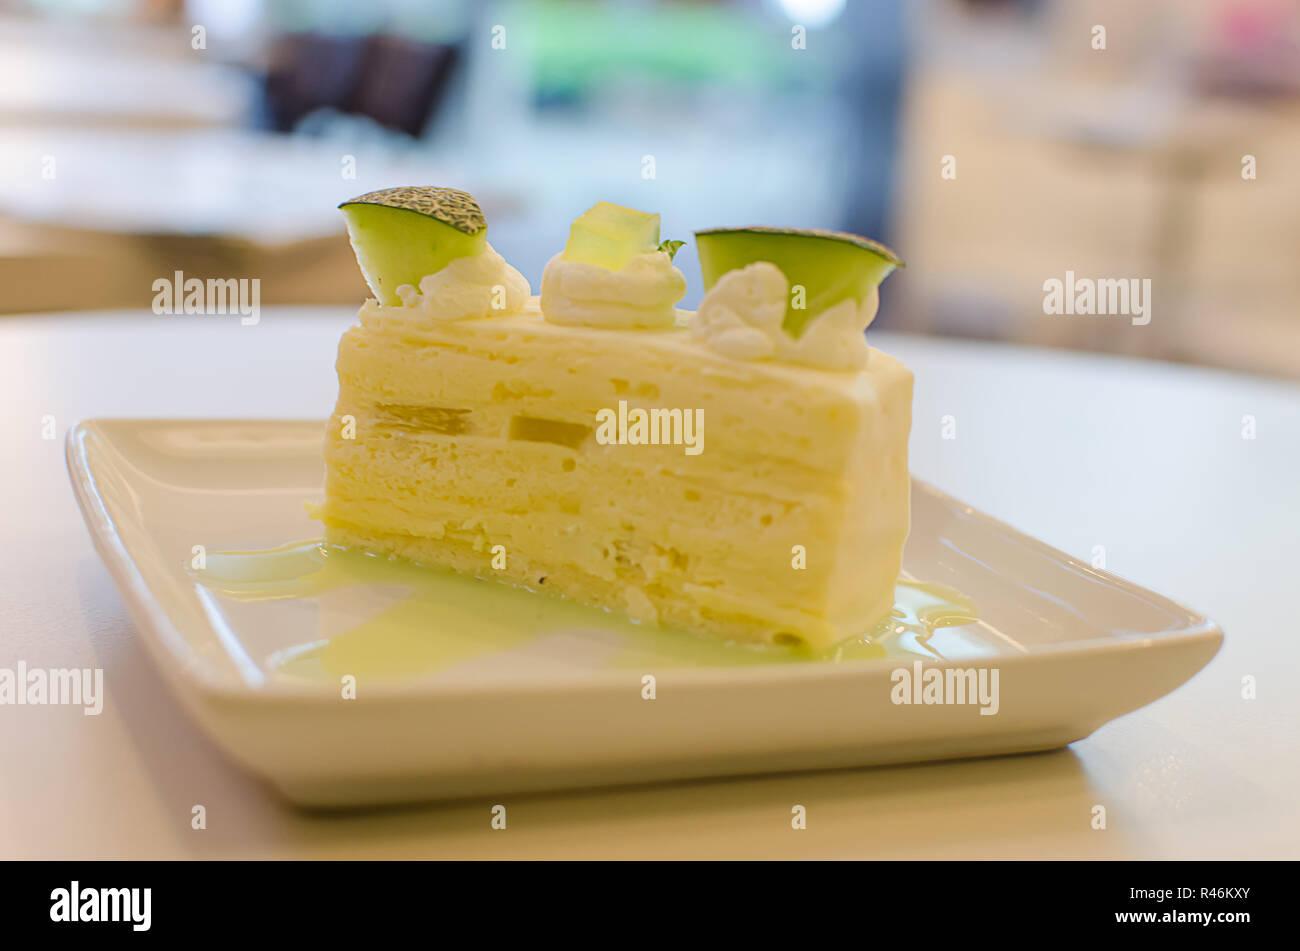 Melon Cake - Stock Image